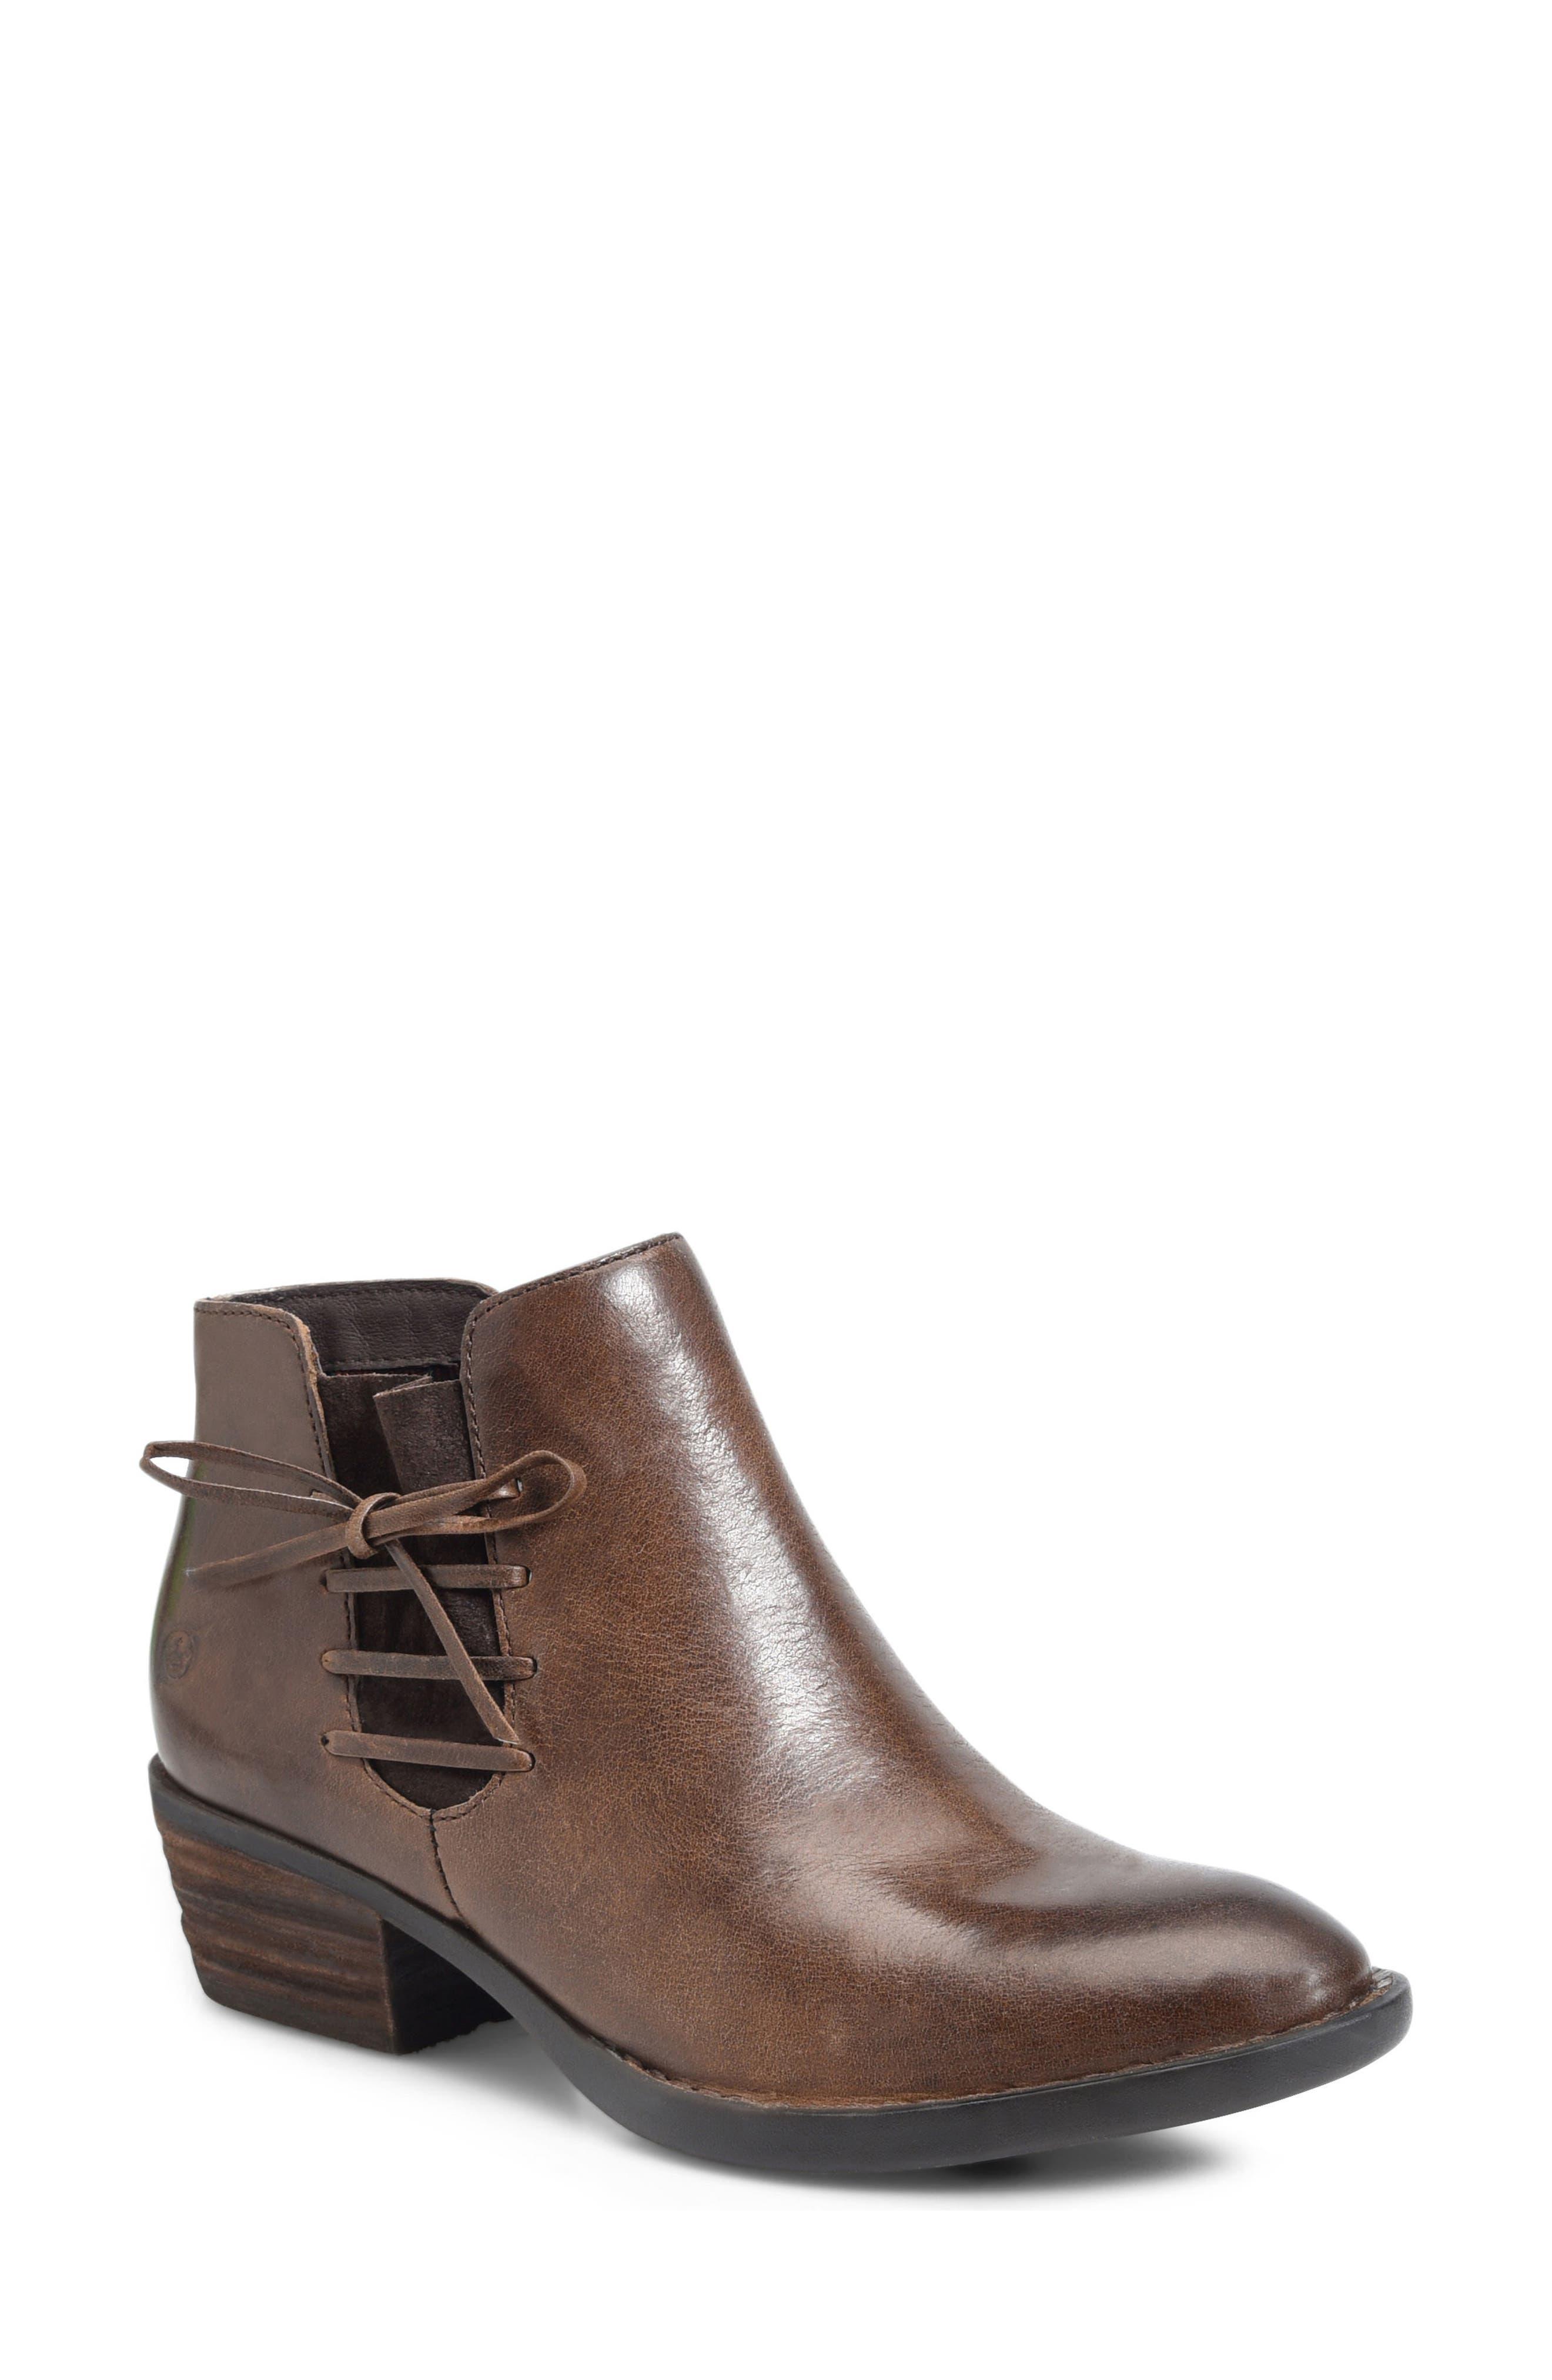 Bowlen Bootie,                         Main,                         color, Brown Leather